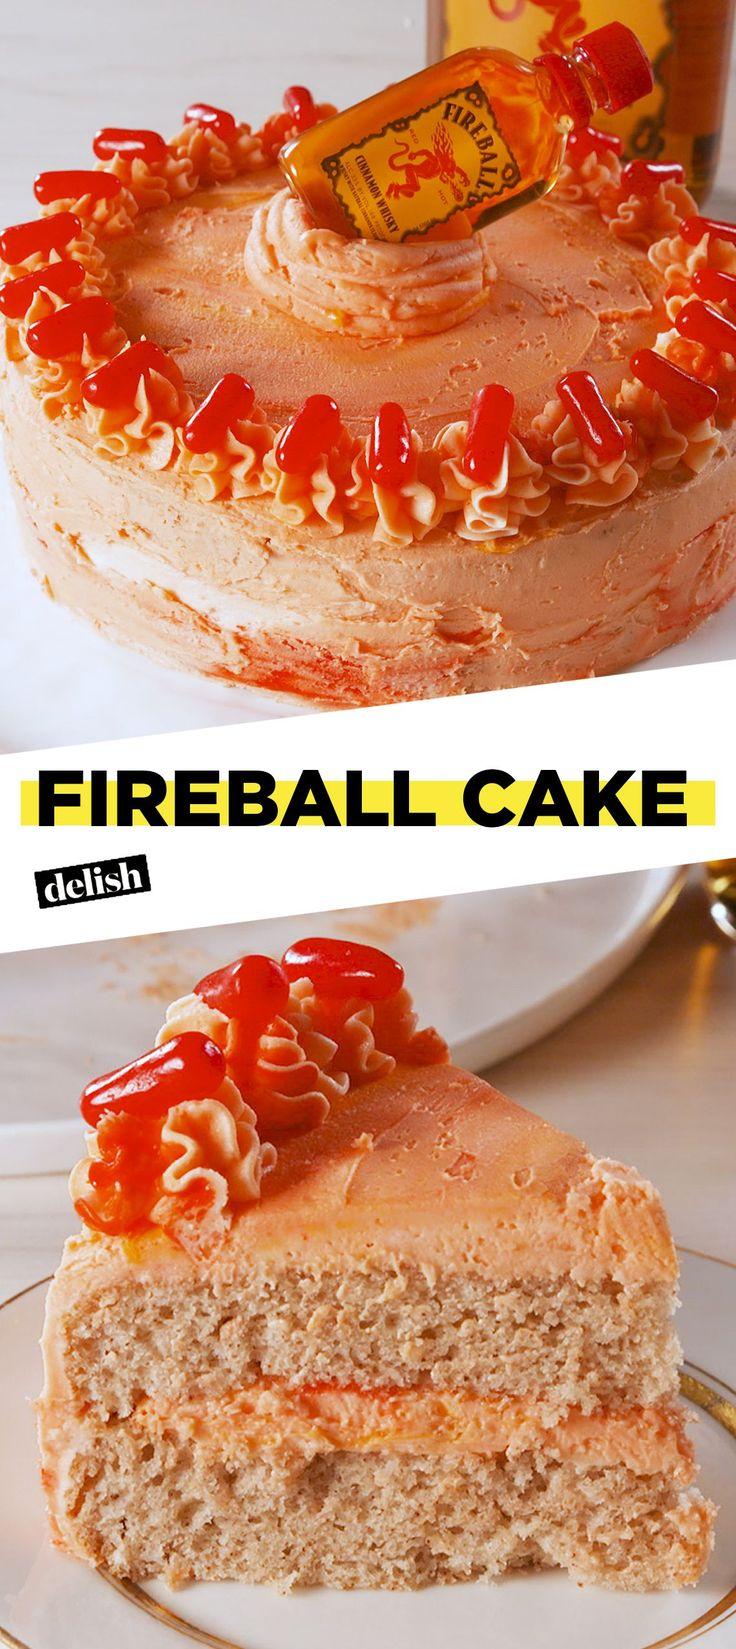 Fireball Cake >>> All Other CakesDelish